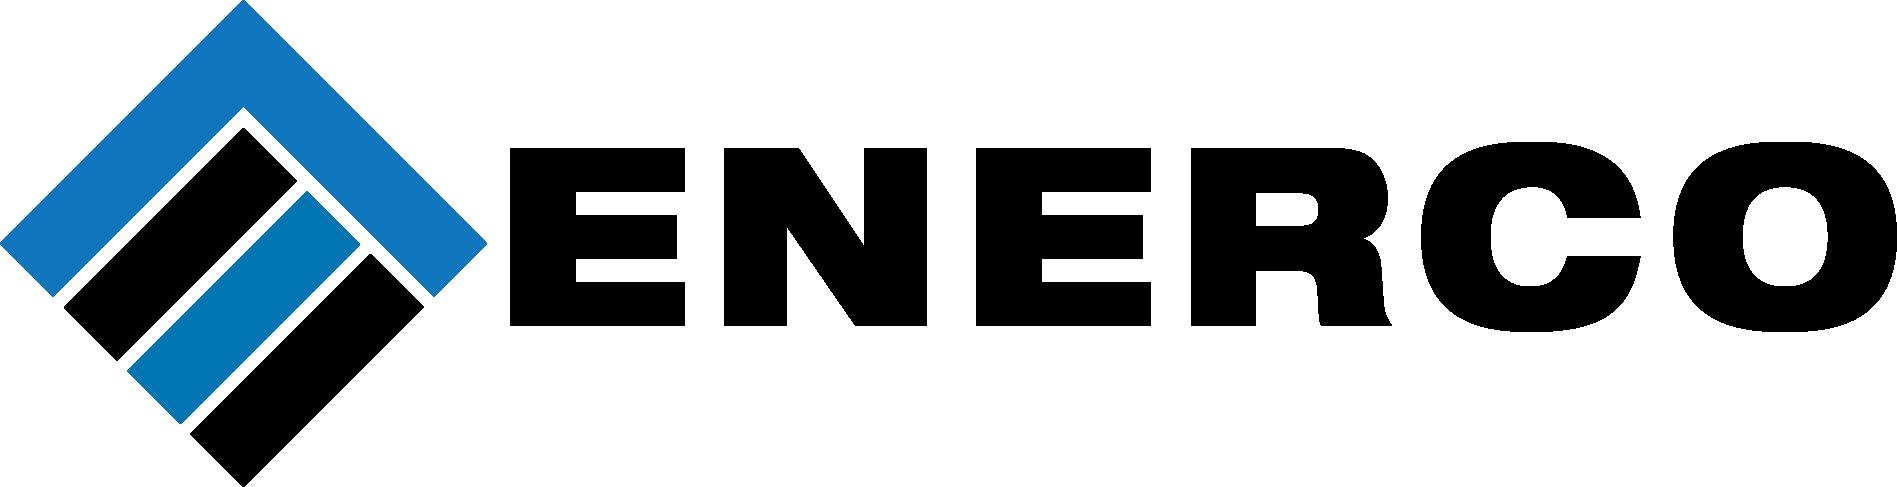 Enerco RV Plan O Gram  - Large (35 Skus)